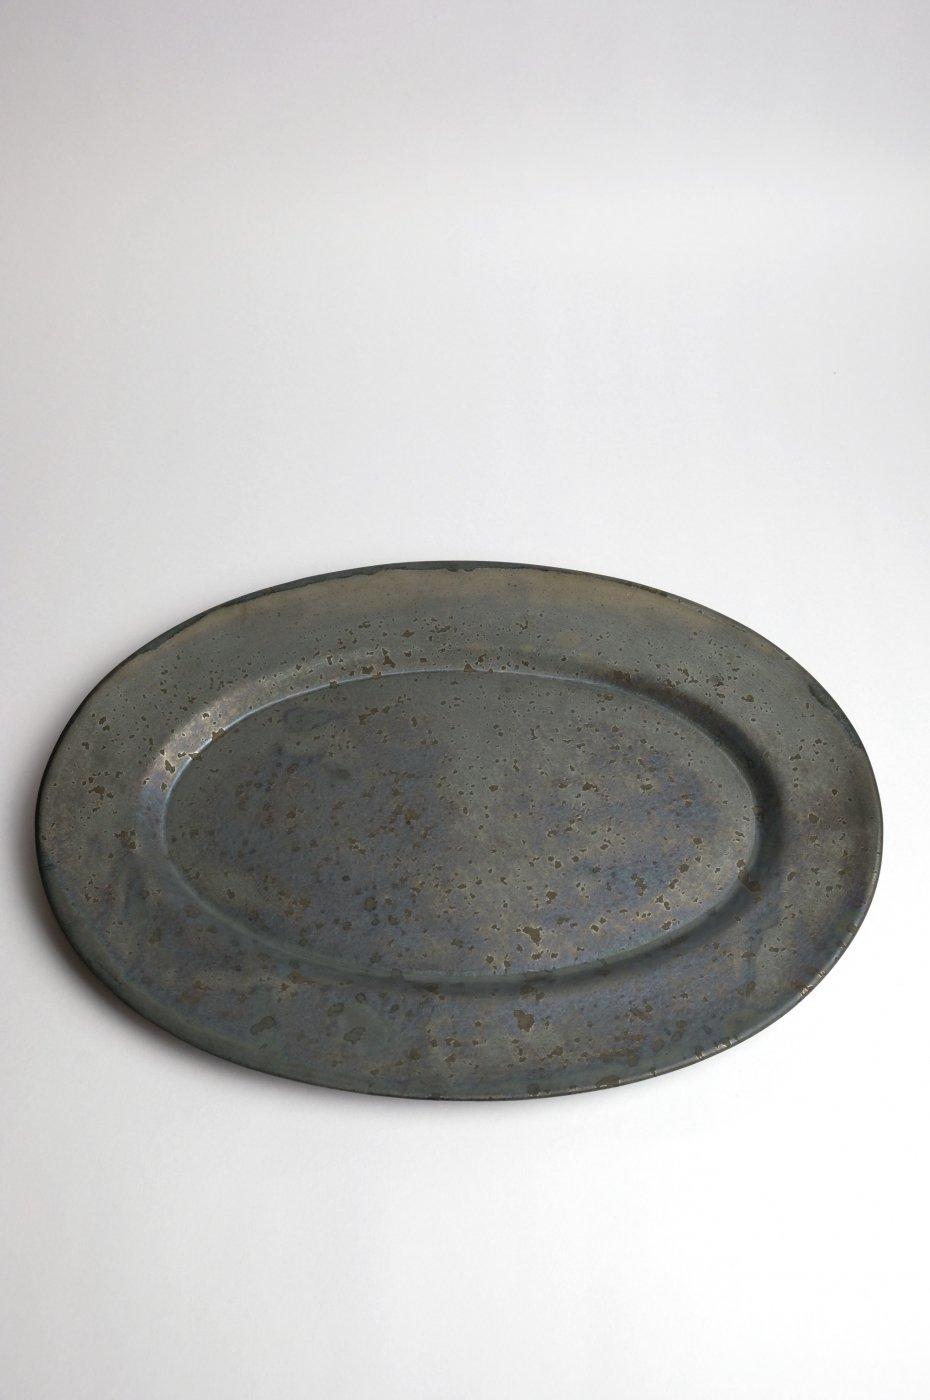 ONE KILN CERAMICS ワンキルン セラミックス -Oval Plate L-